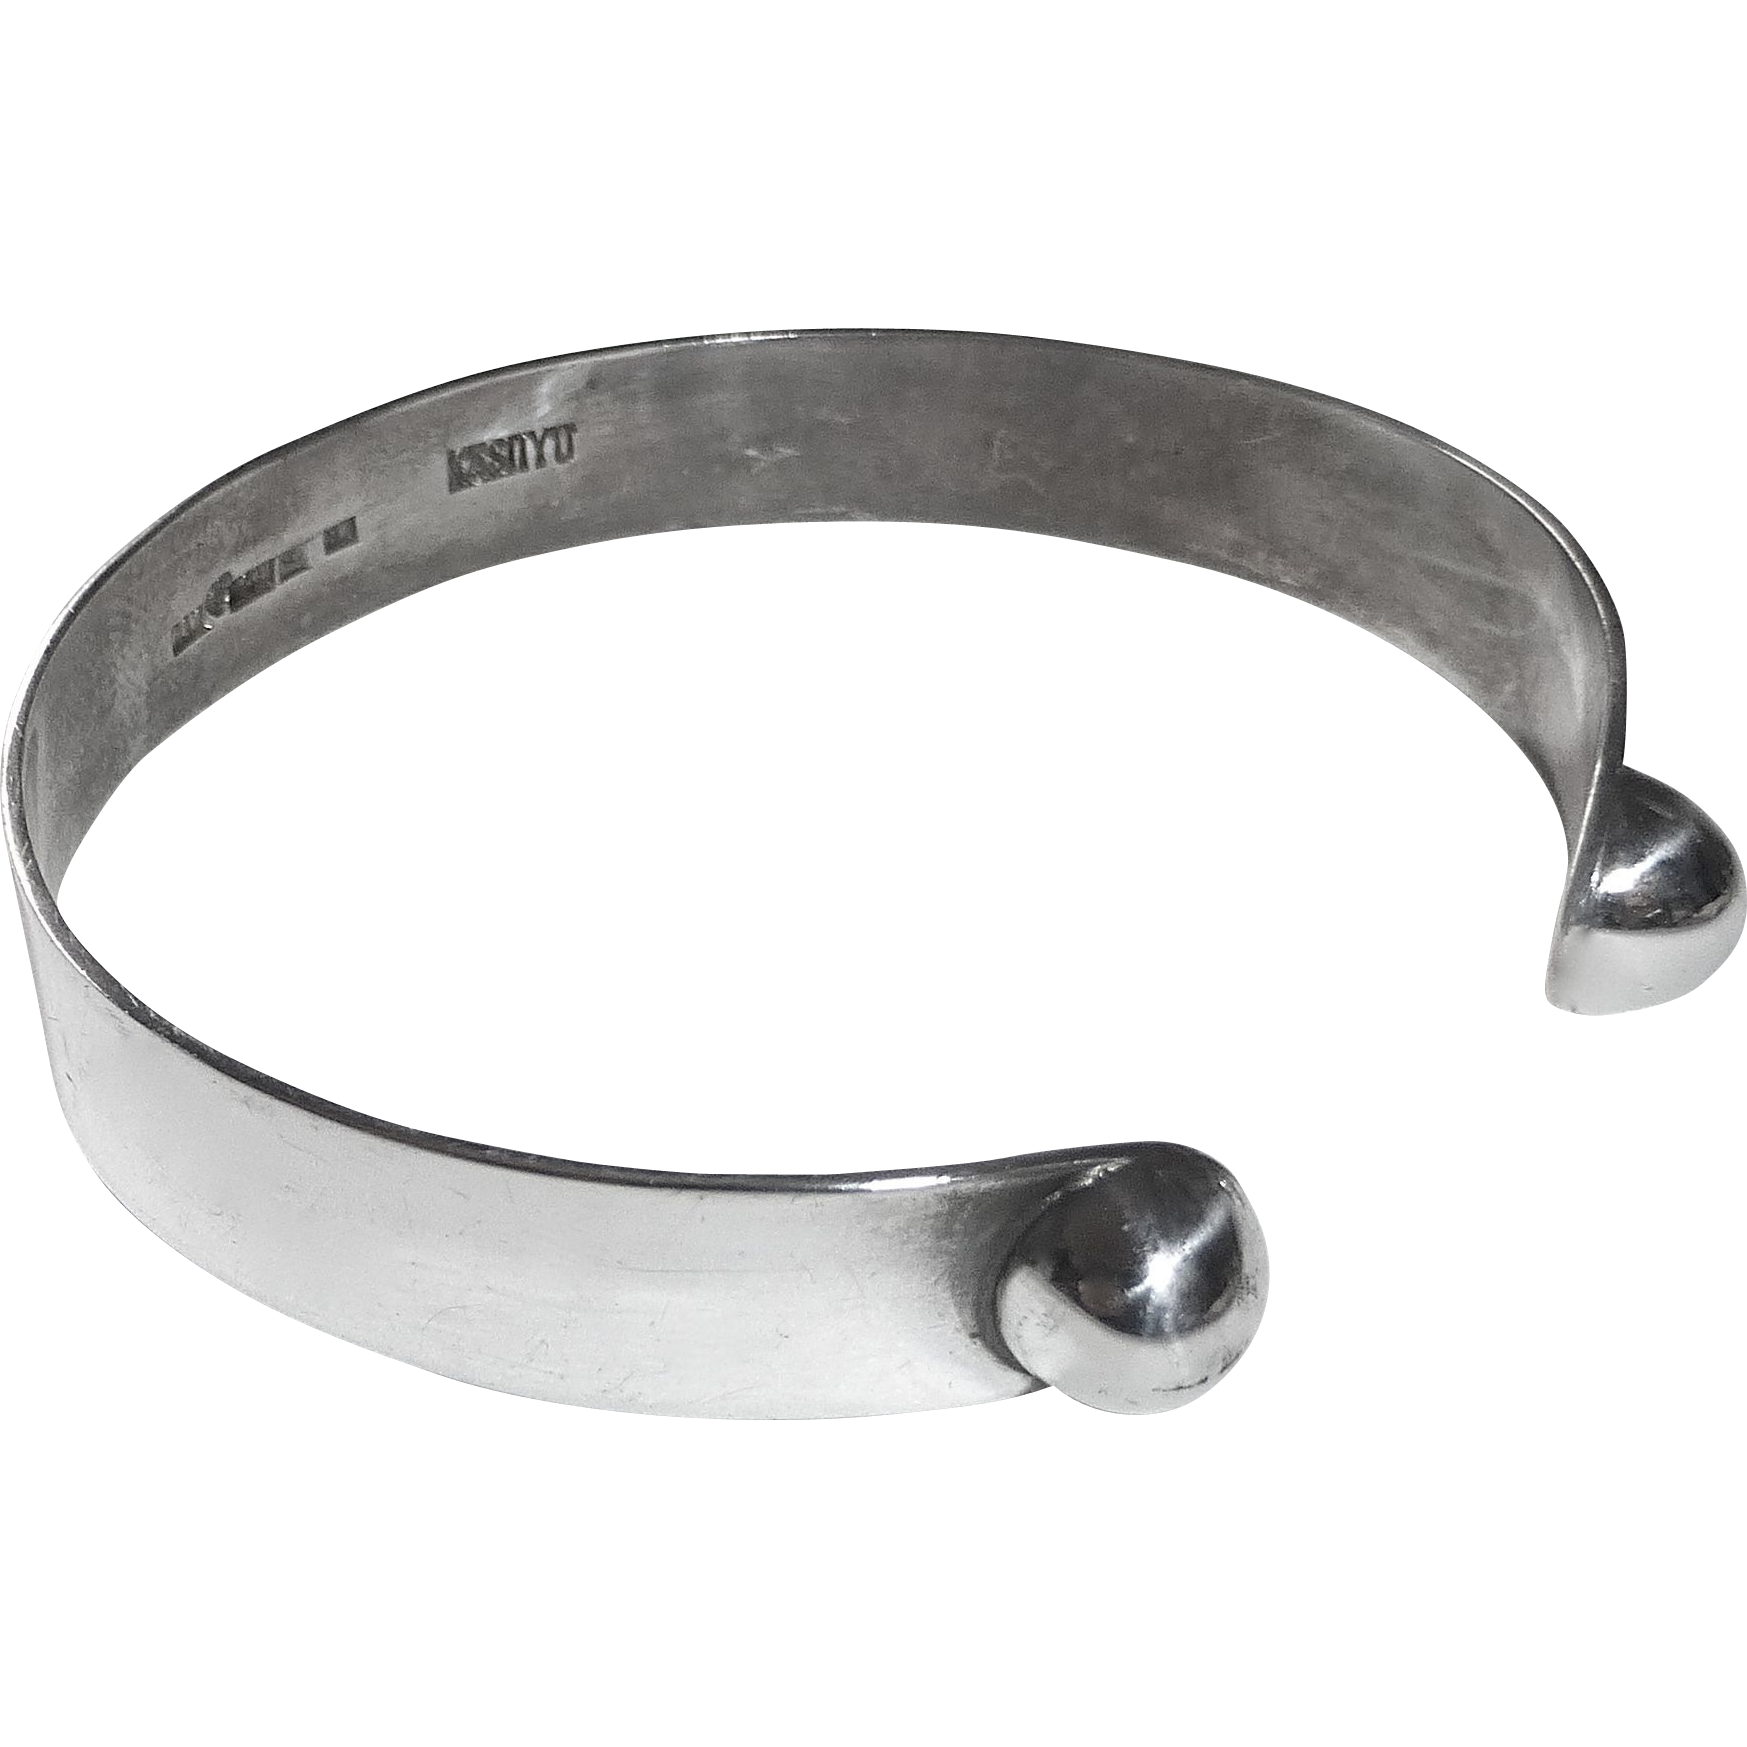 Mid-Century Modern Finnish Silver Cuff Bracelet